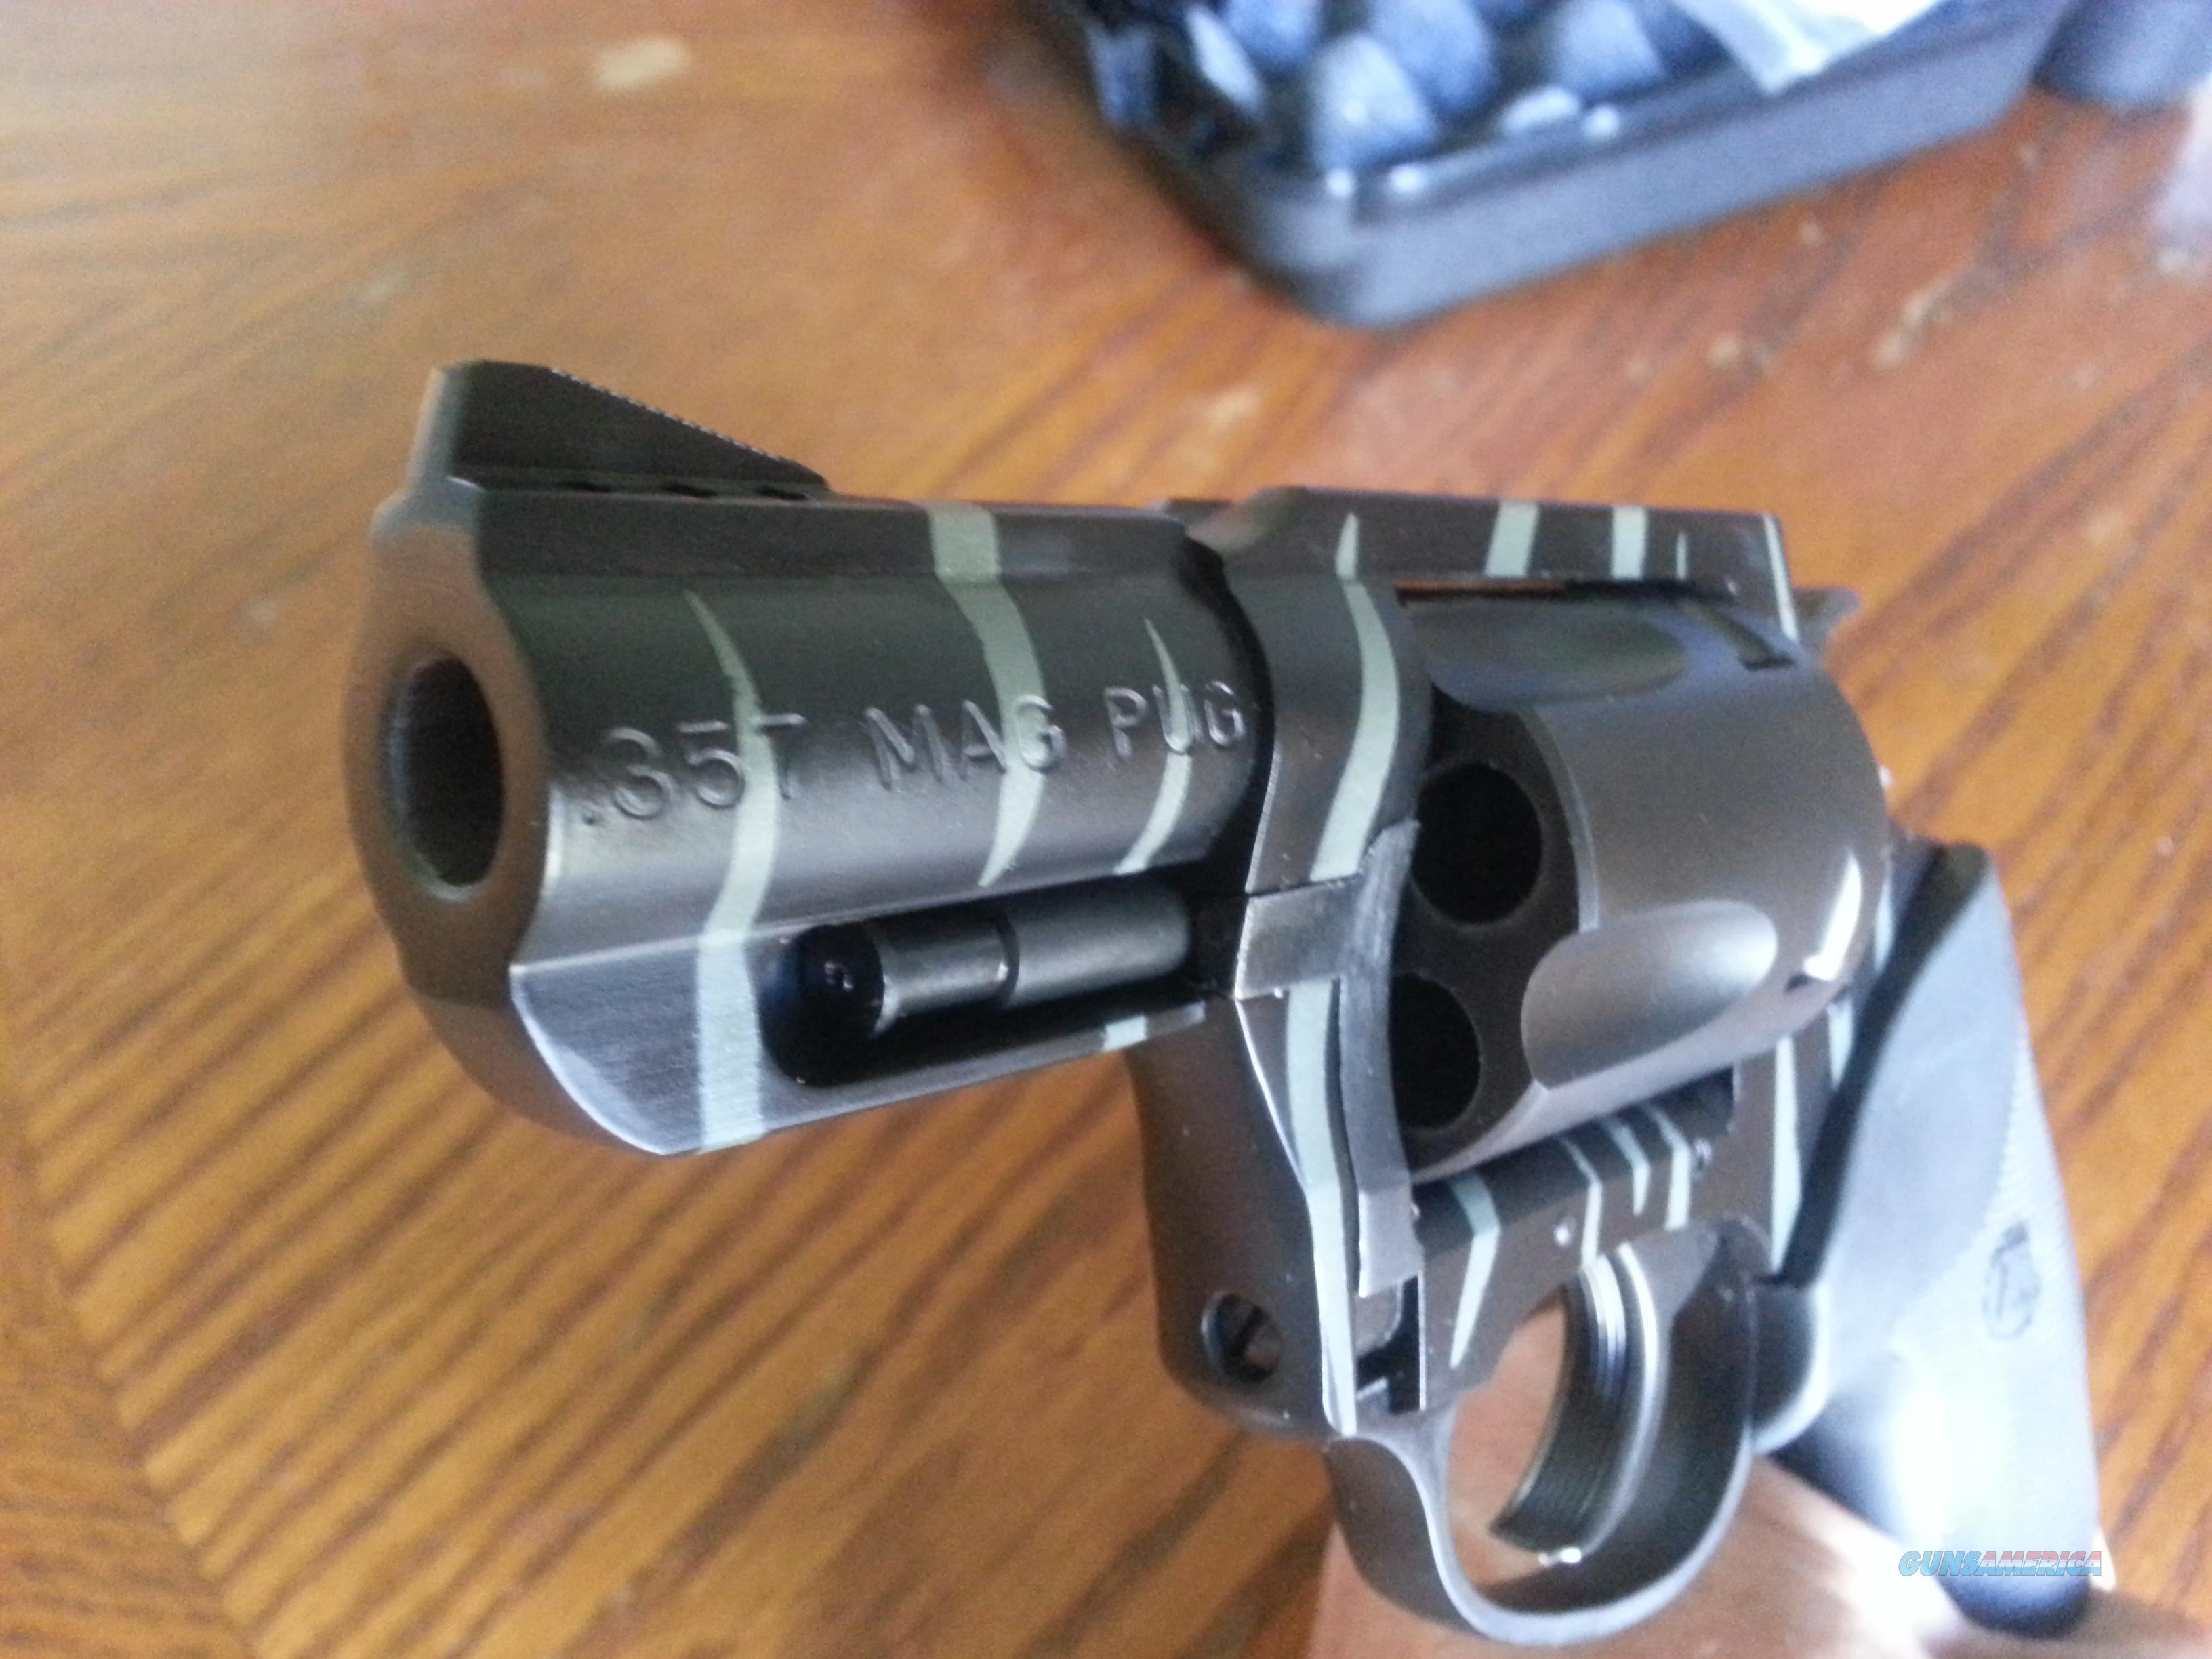 Charter Arms Pug 357 Mag Black and Green Tiger Stripes SnubNose 5 Shot NIB FREE LAYAWAY!!!  Guns > Pistols > Charter Arms Revolvers